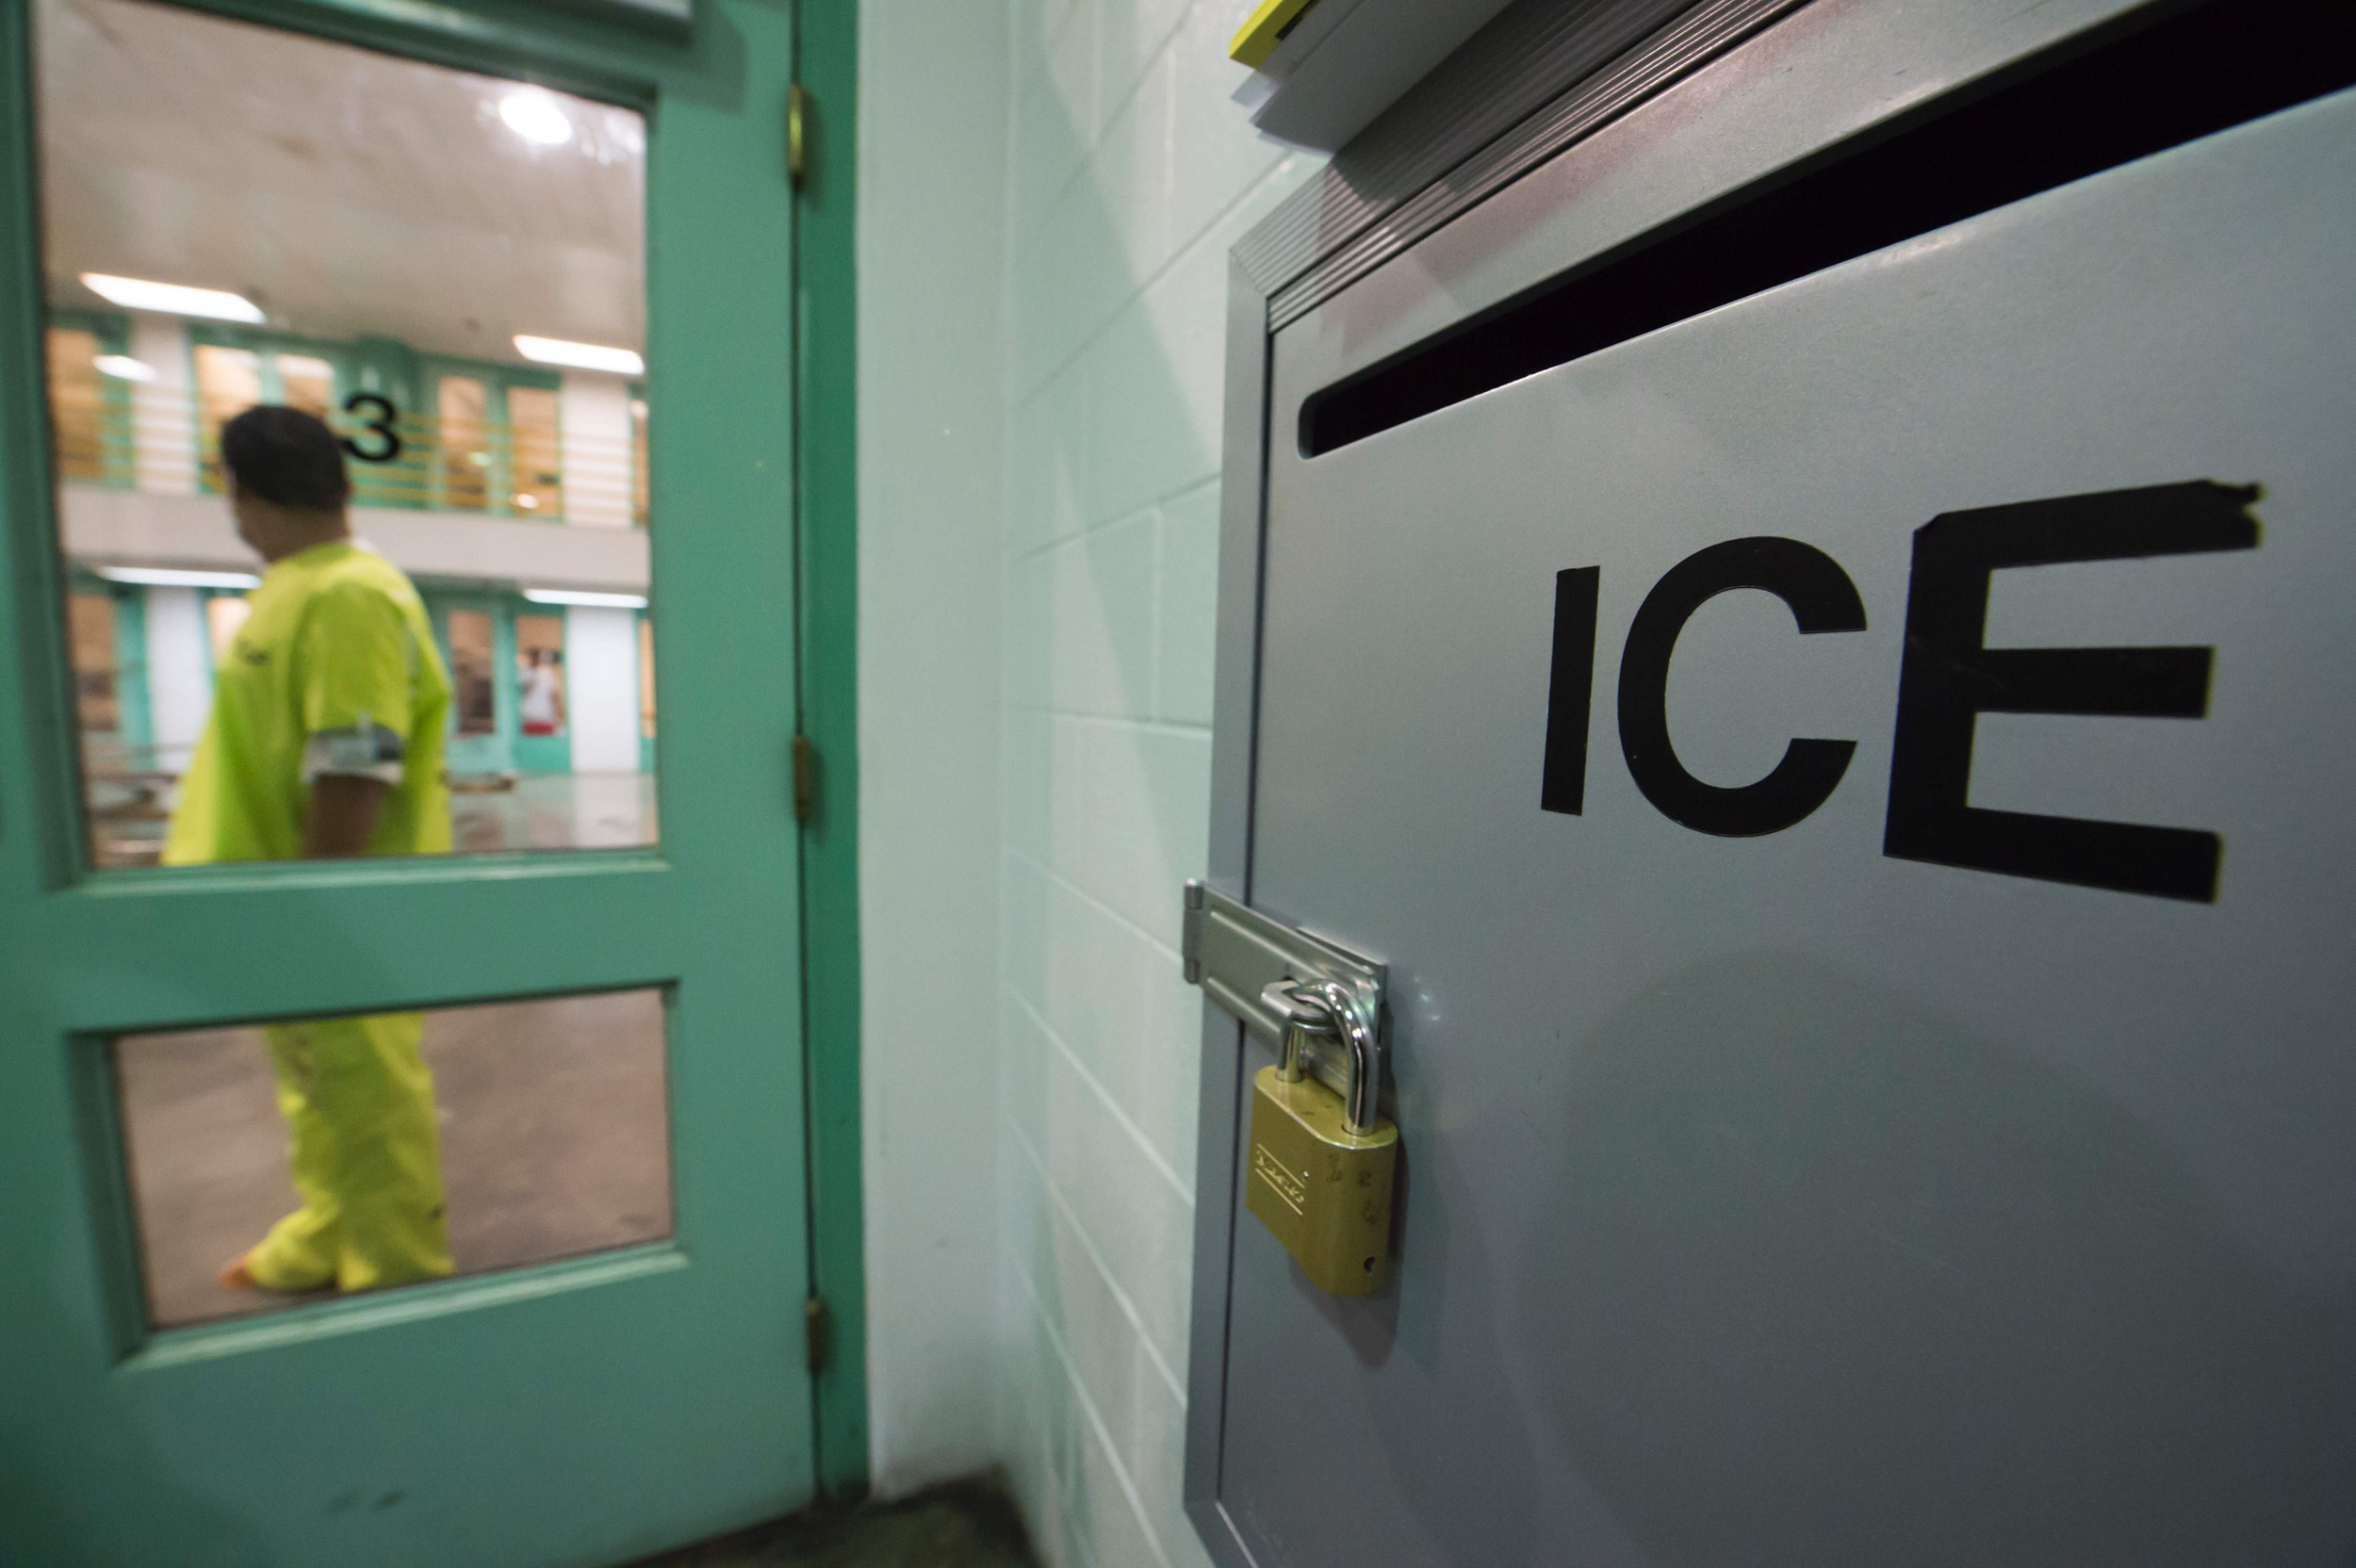 ICE Deportation Officers Overburdened, Undertrained: Inspector General